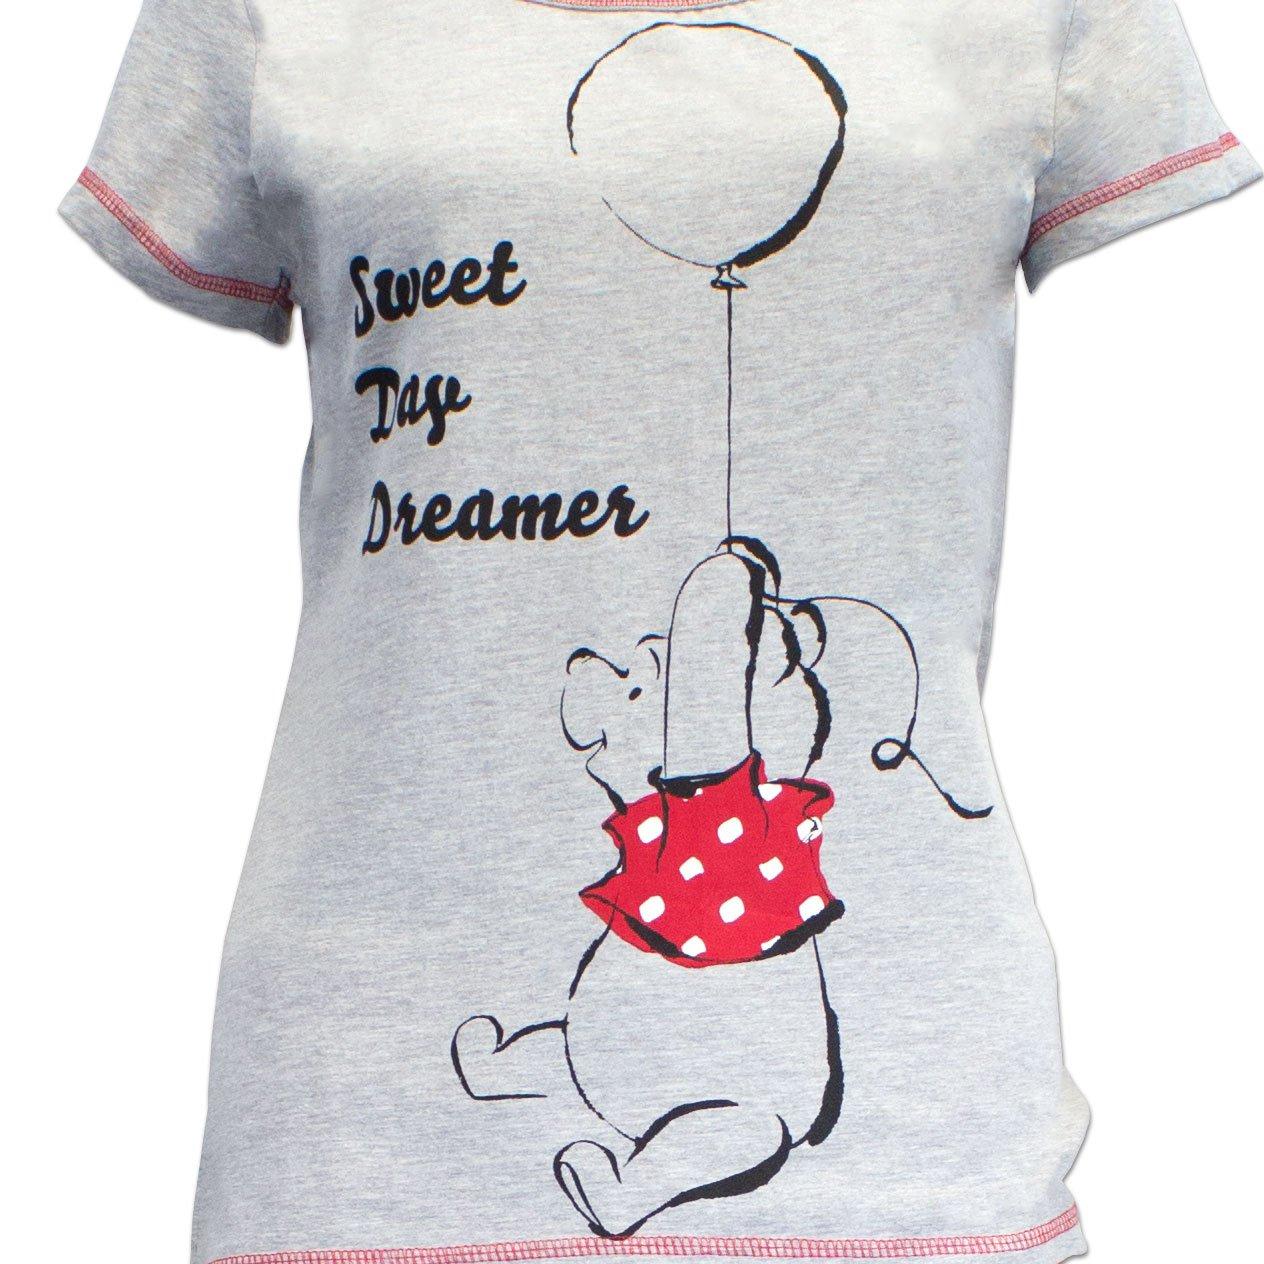 Winnie The Pooh - Pijama para mujer - Winnie Pu - 46 - 48: Amazon.es: Ropa y accesorios